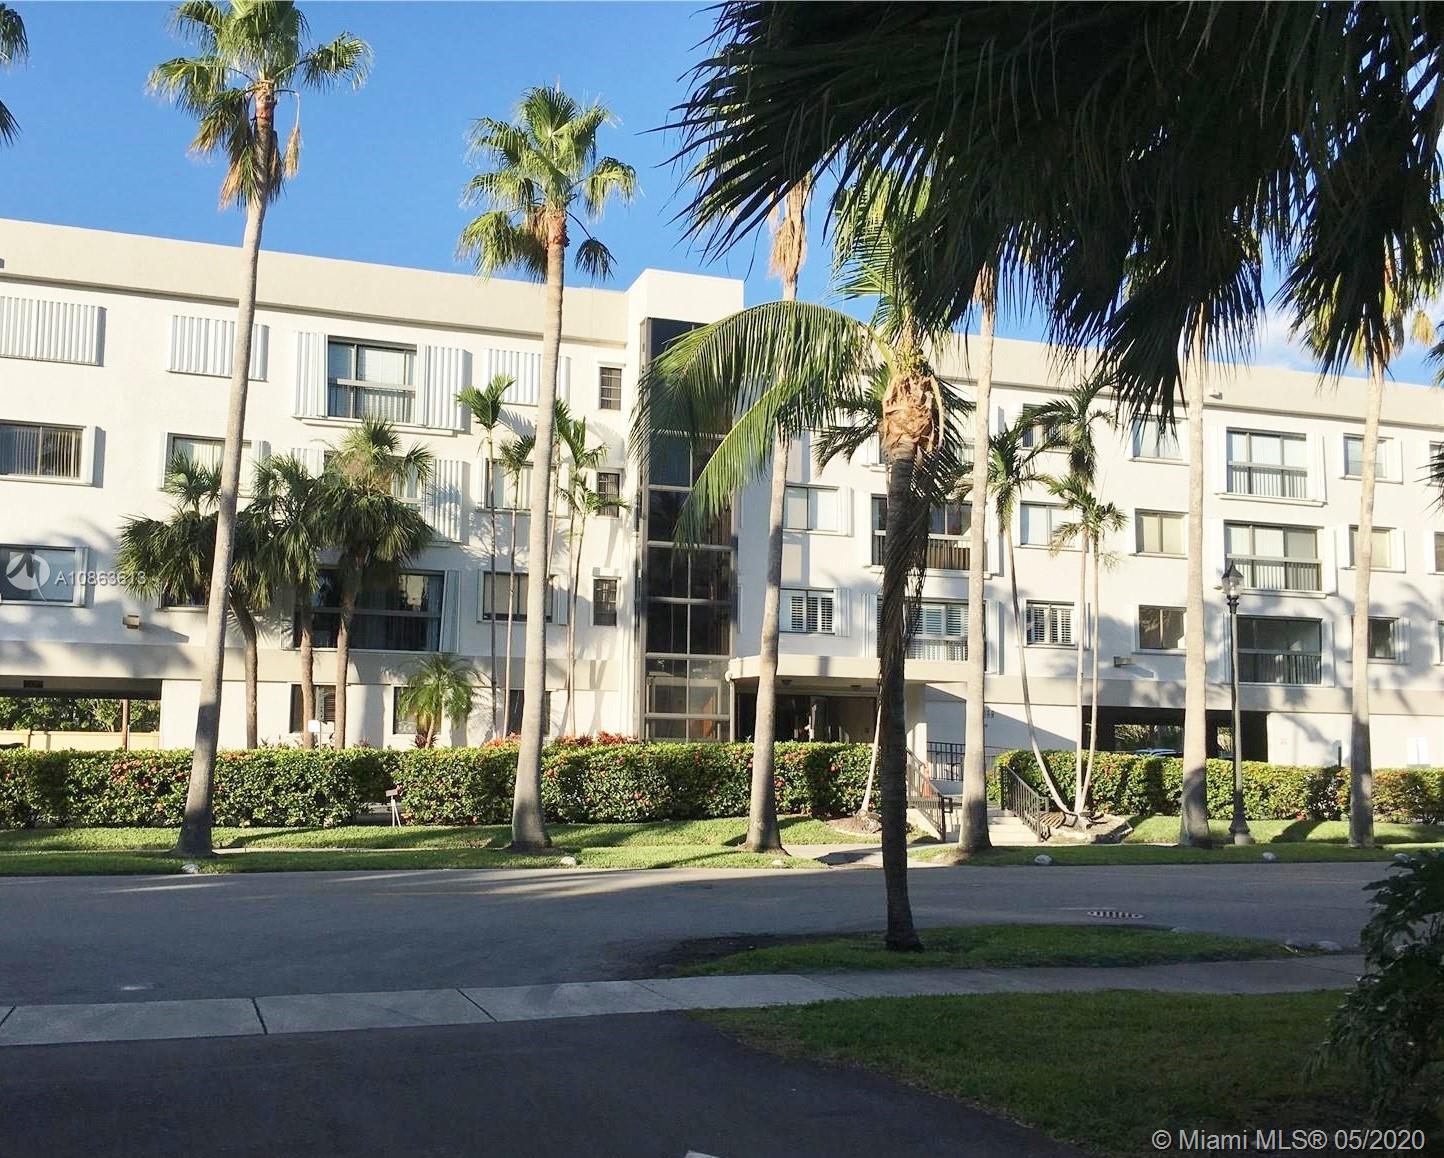 255 Galen Dr # 4H, Key Biscayne, Florida 33149, 2 Bedrooms Bedrooms, ,2 BathroomsBathrooms,Residential,For Sale,255 Galen Dr # 4H,A10863613